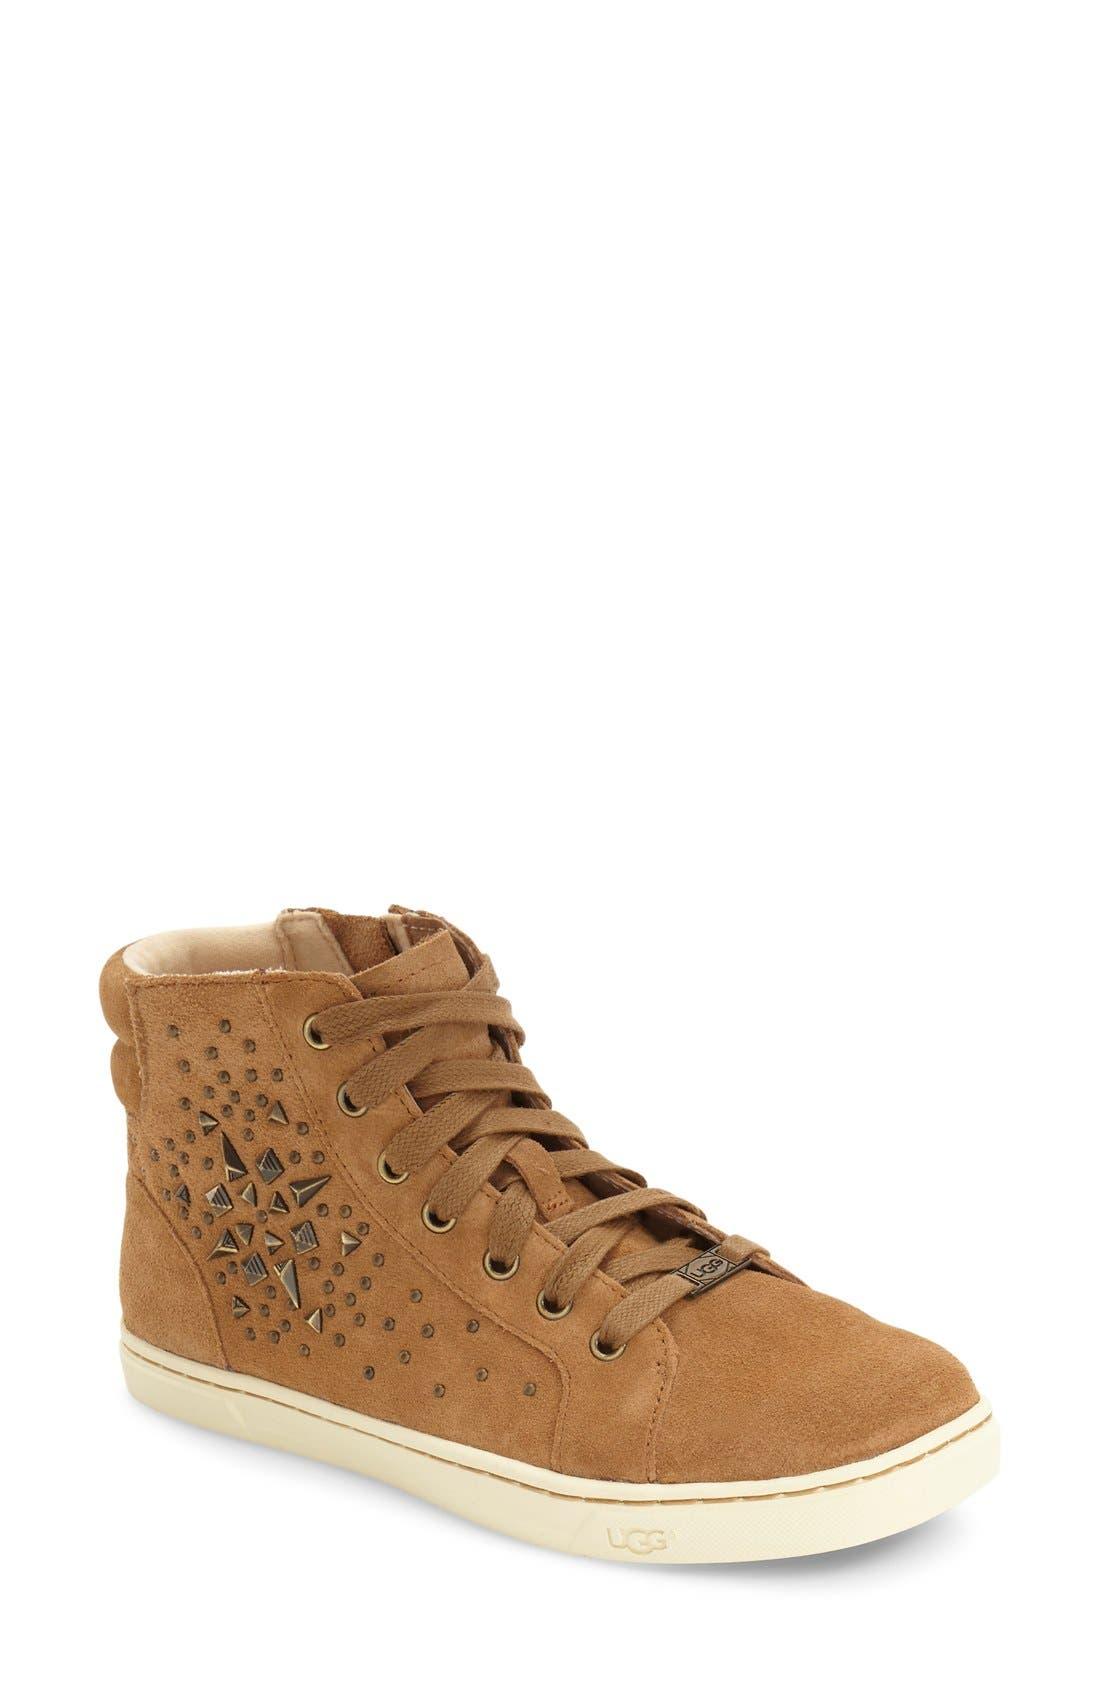 Main Image - UGG® Gradie Deco Stud High Top Sneaker (Women)